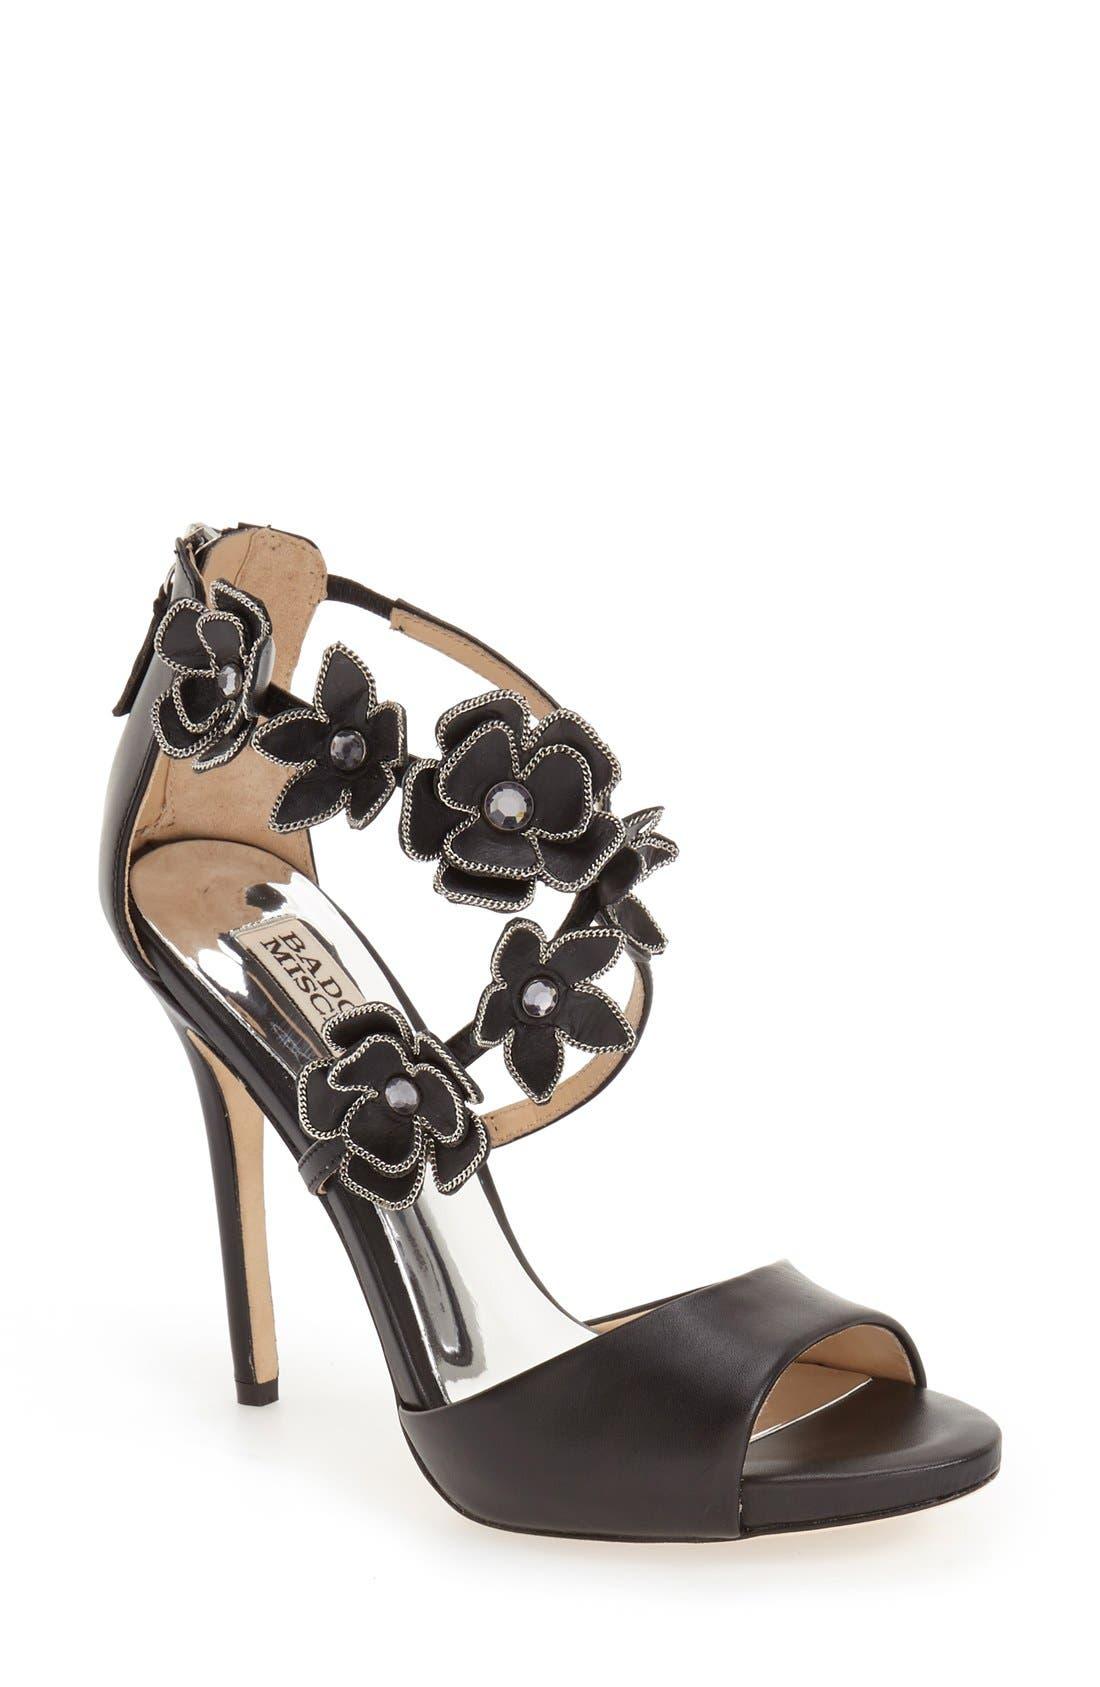 Main Image - Badgley Mischka 'Langley' Floral Appliqué Sandal (Women)